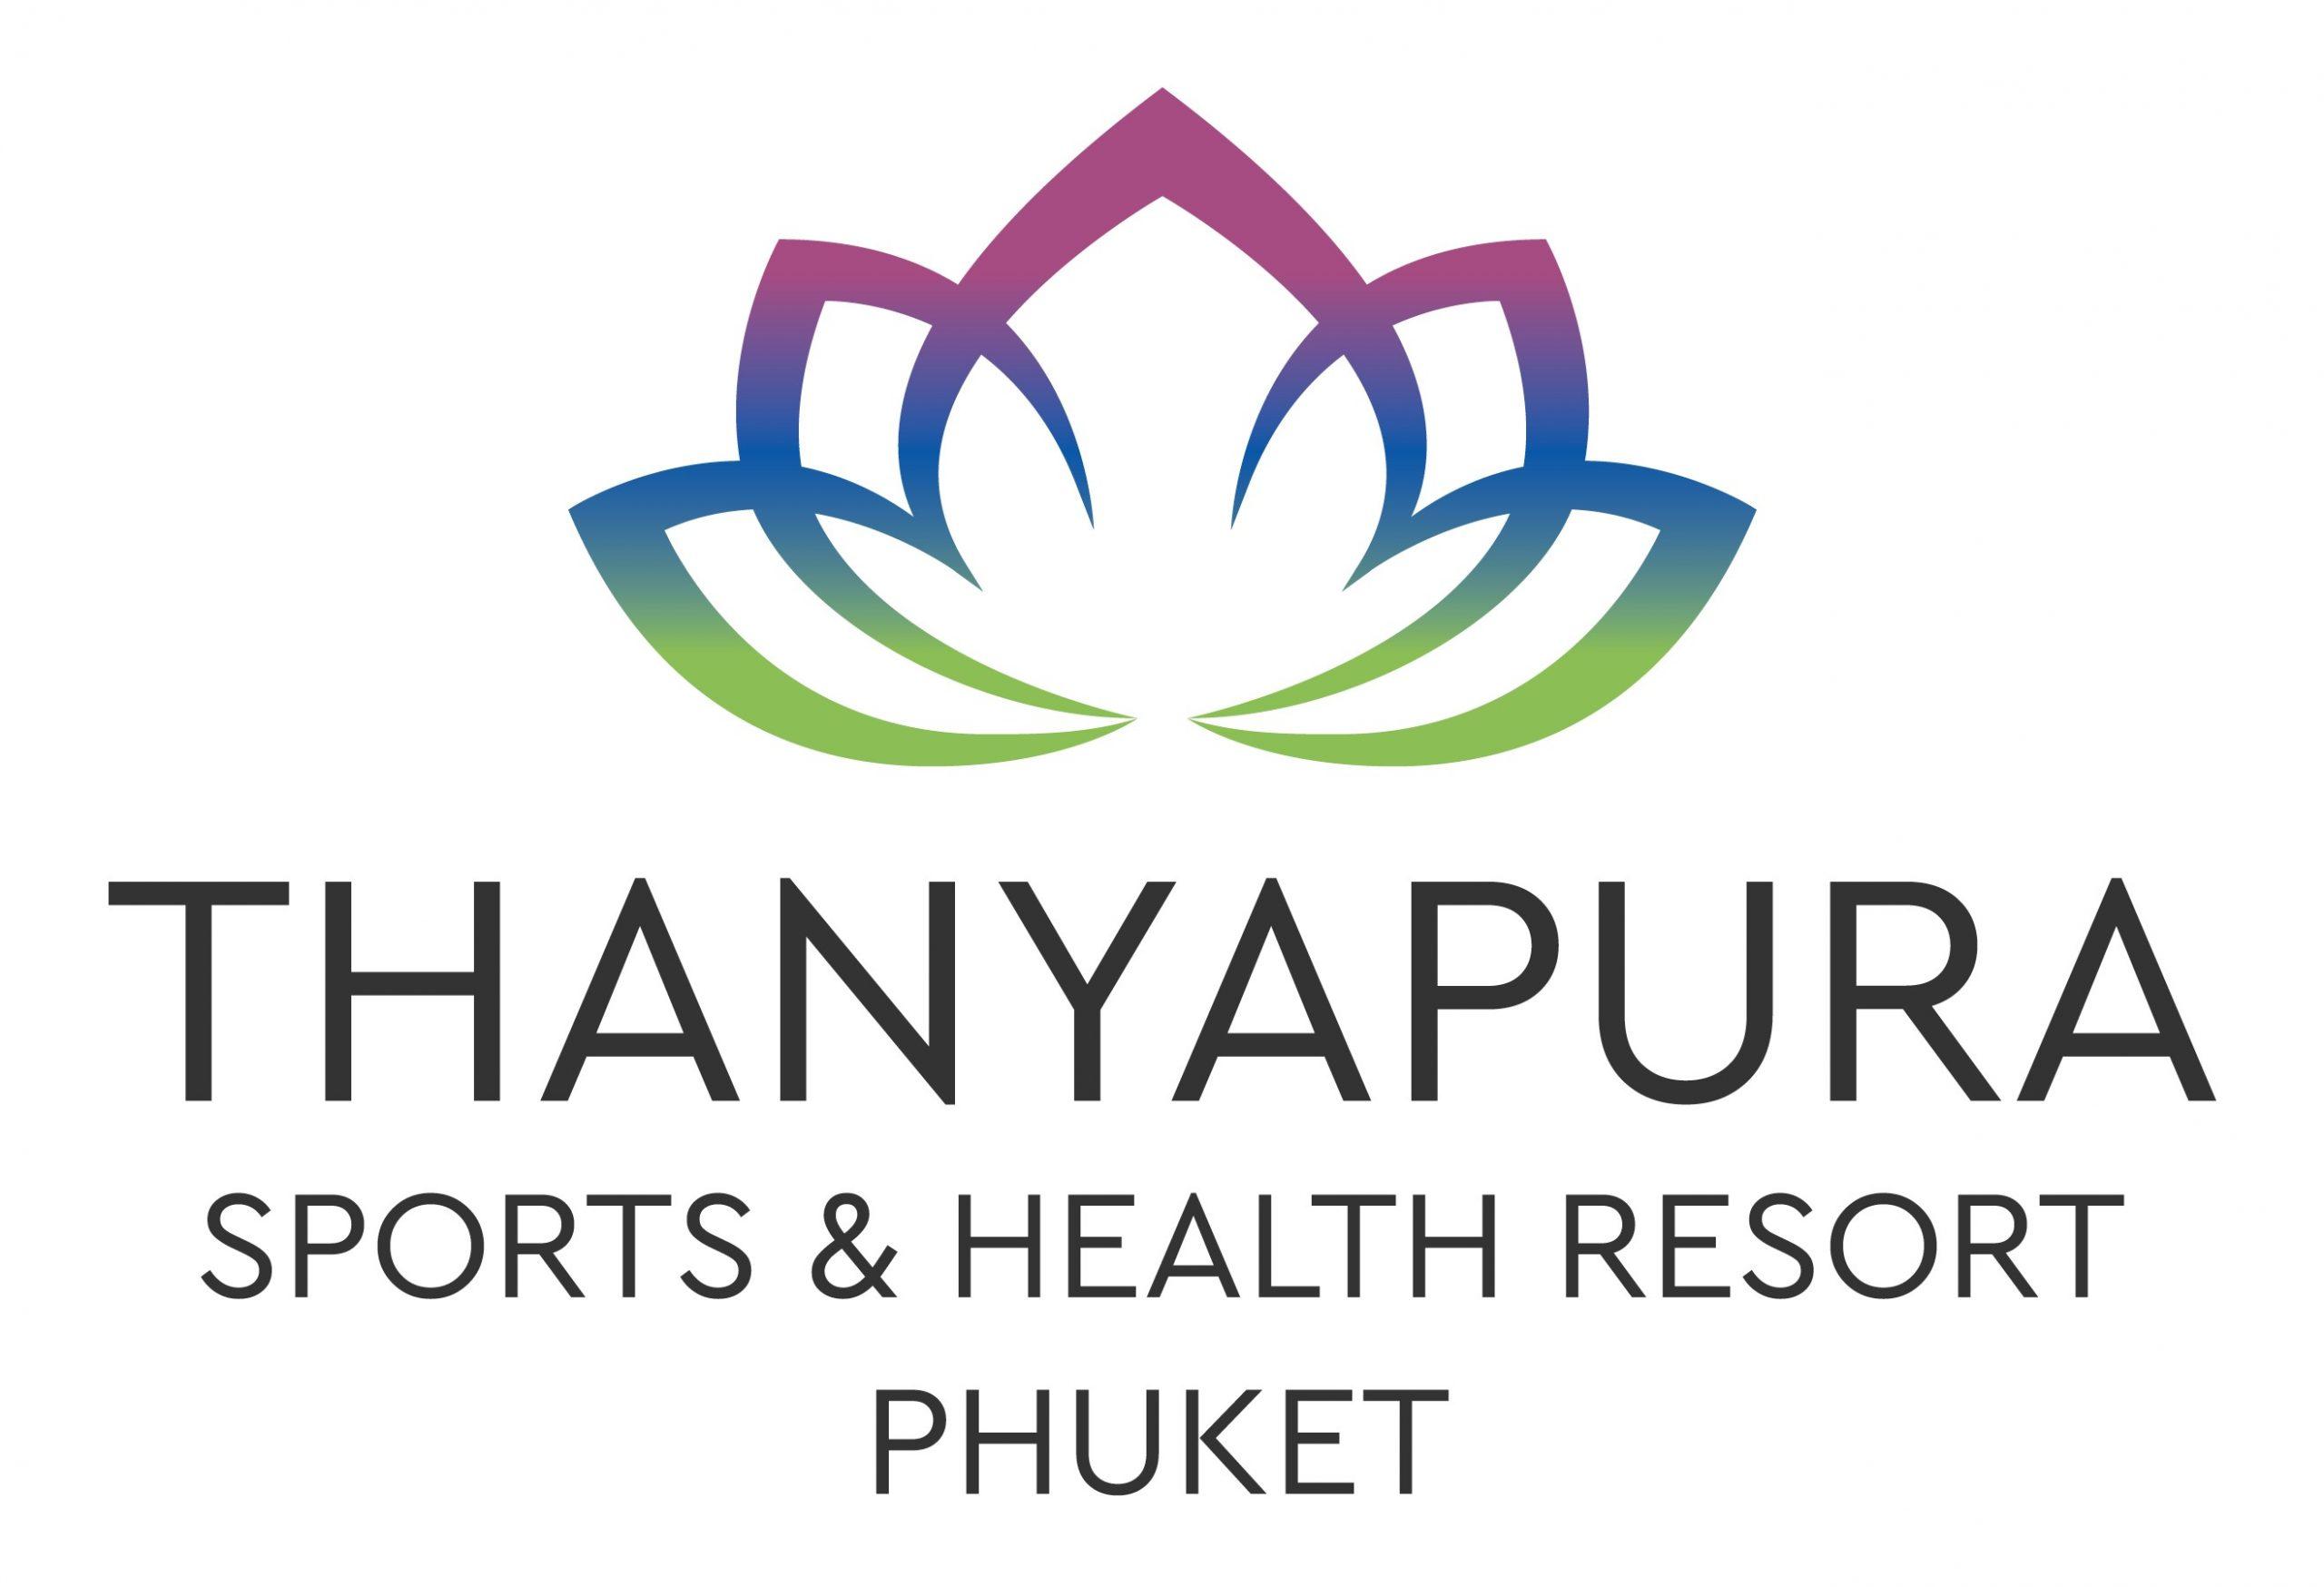 Thanyapura Sports & Health Resort logo